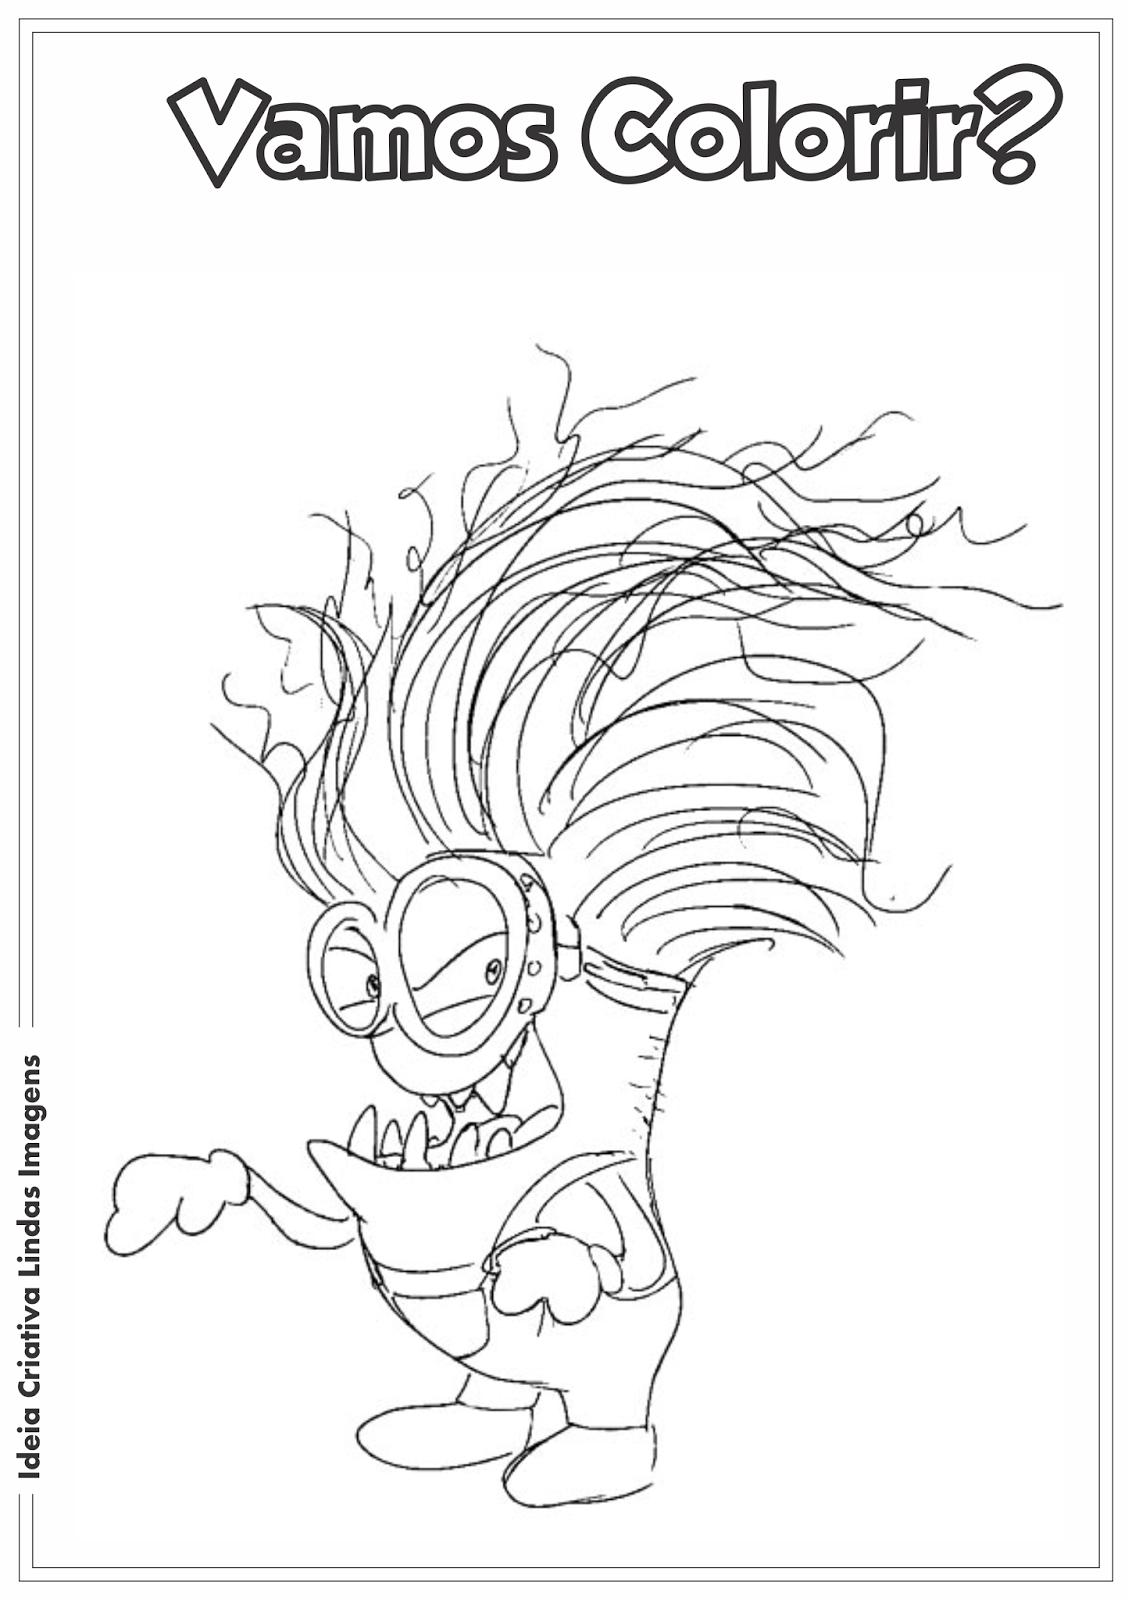 Meu Malvado Favorito 2 - Minion Malvado desenho para colorir